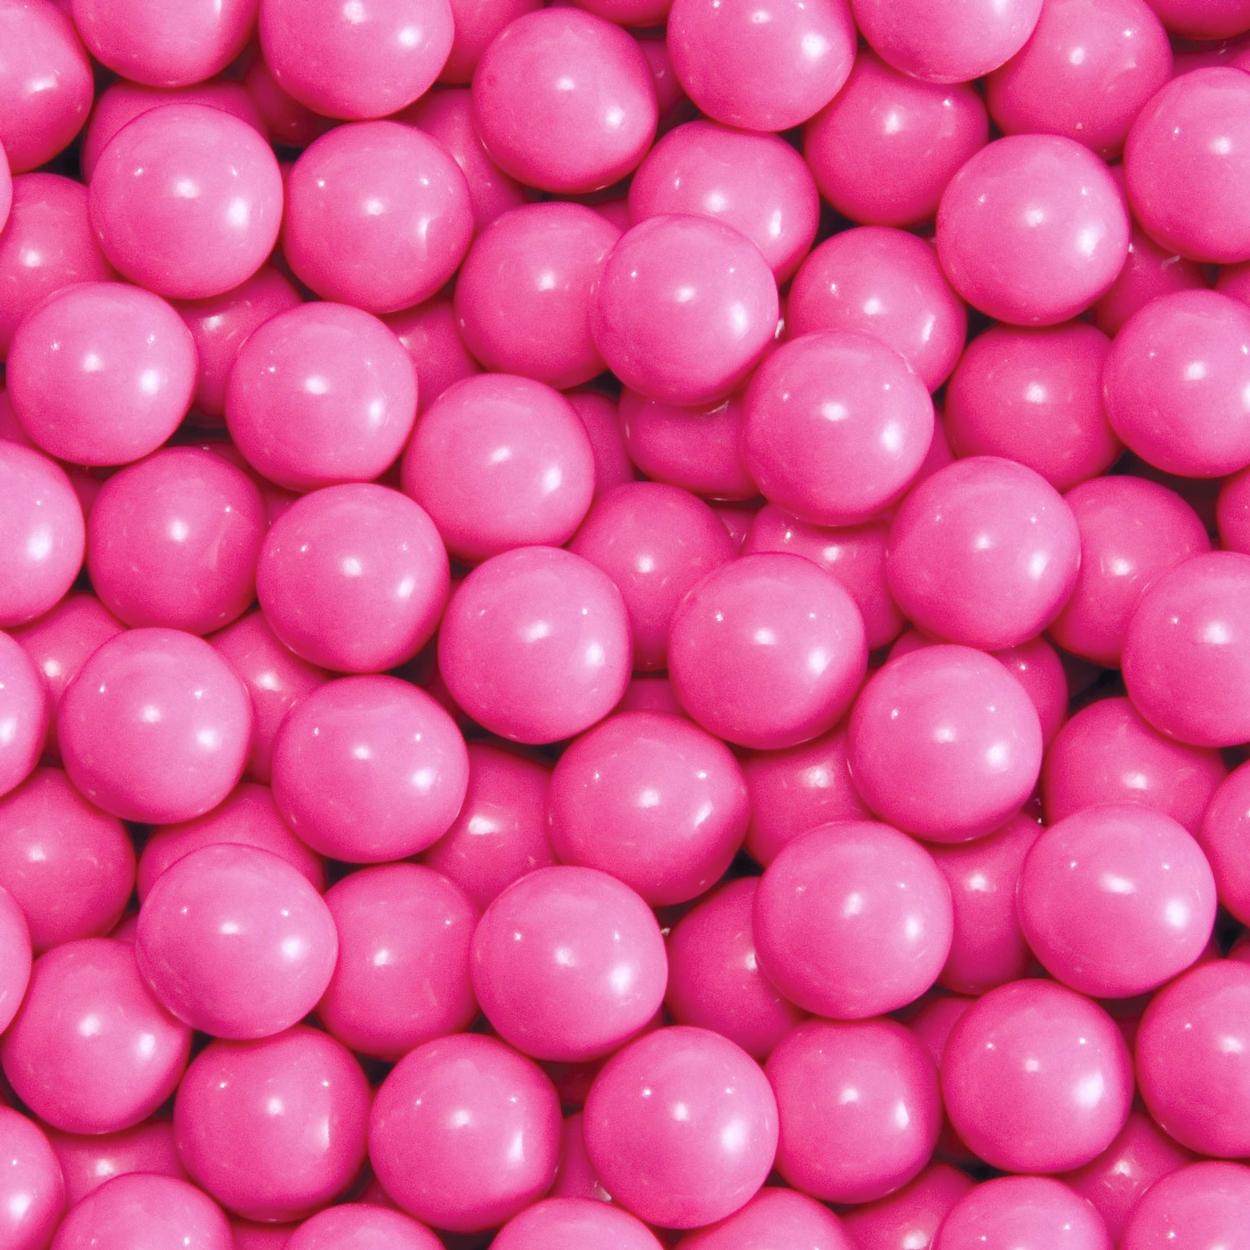 Hot Pink Sixlets • Sixlets - Milk Chocolate Candy Balls • Oh! Nuts®